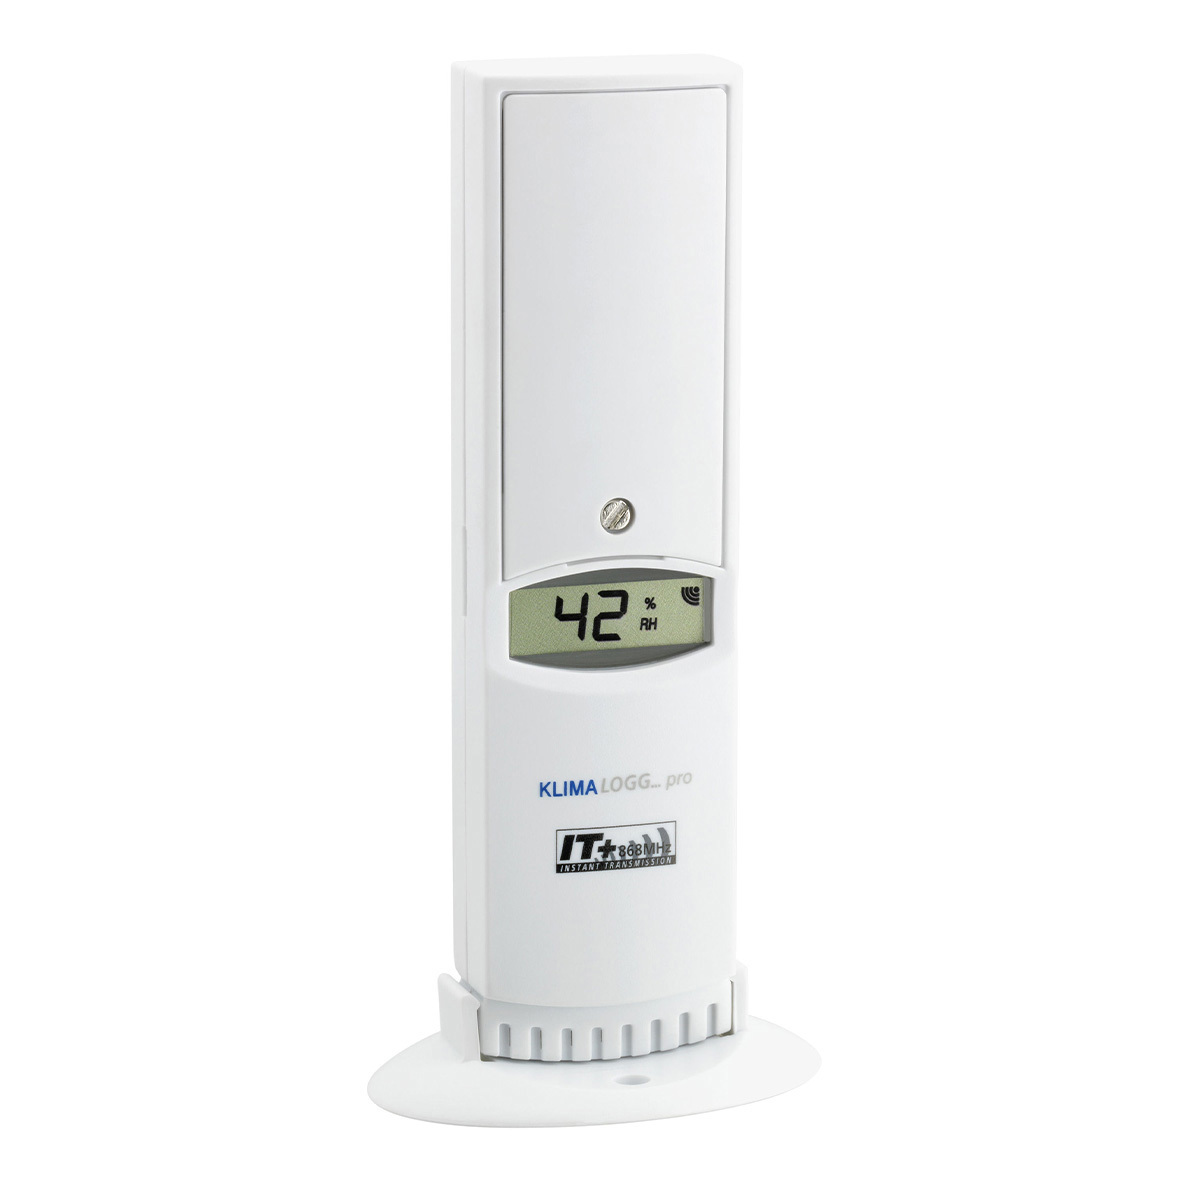 30-3060-01-it-funk-thermo-hygrometer-mit-3-sendern-klima@home-sender-1200x1200px.jpg